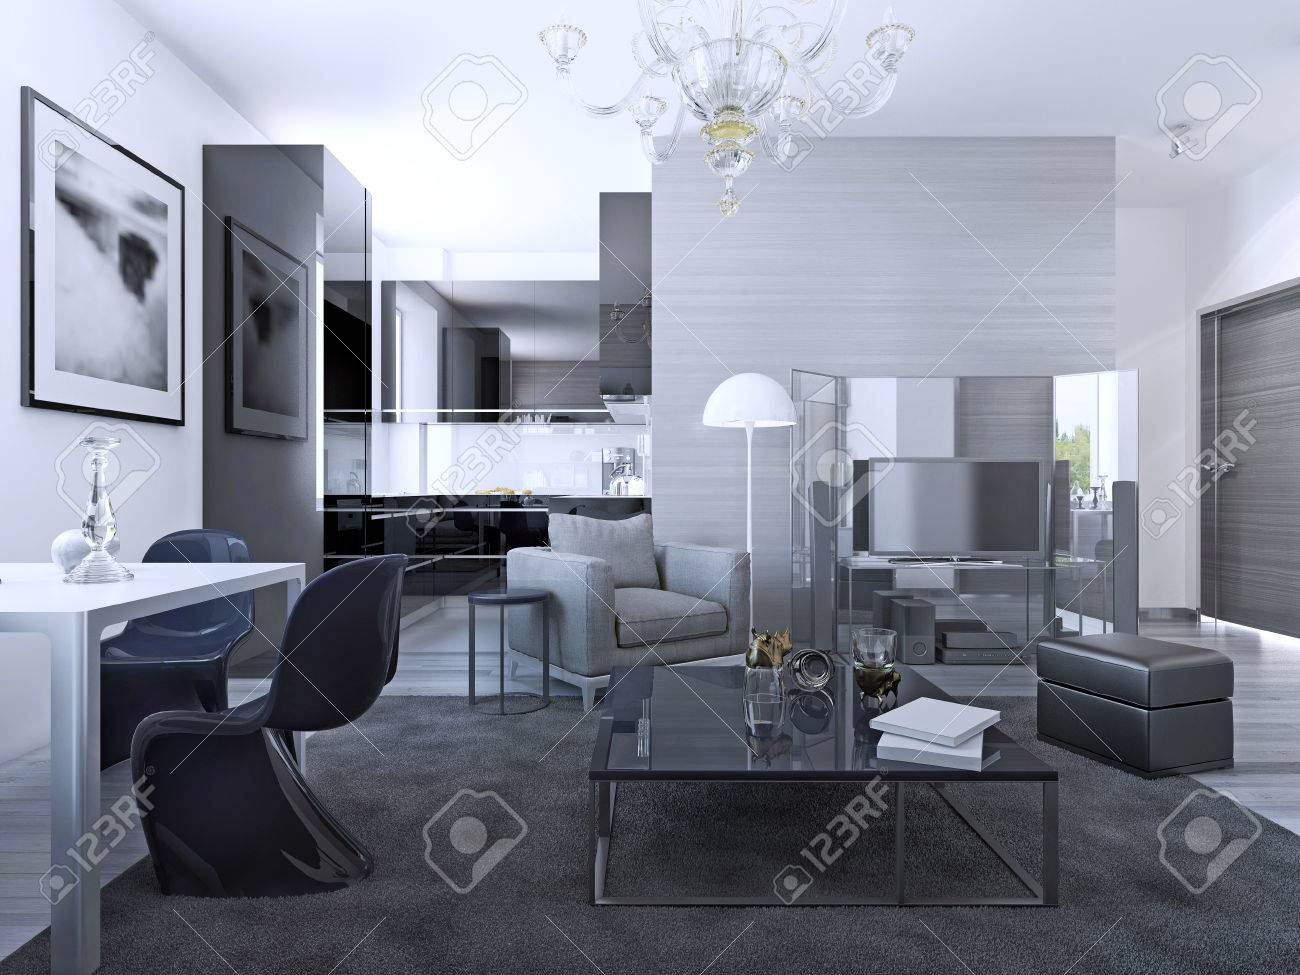 Contemporary Living Room Studio Light Grey Walls Furniture Elegant Kitchen Of Background